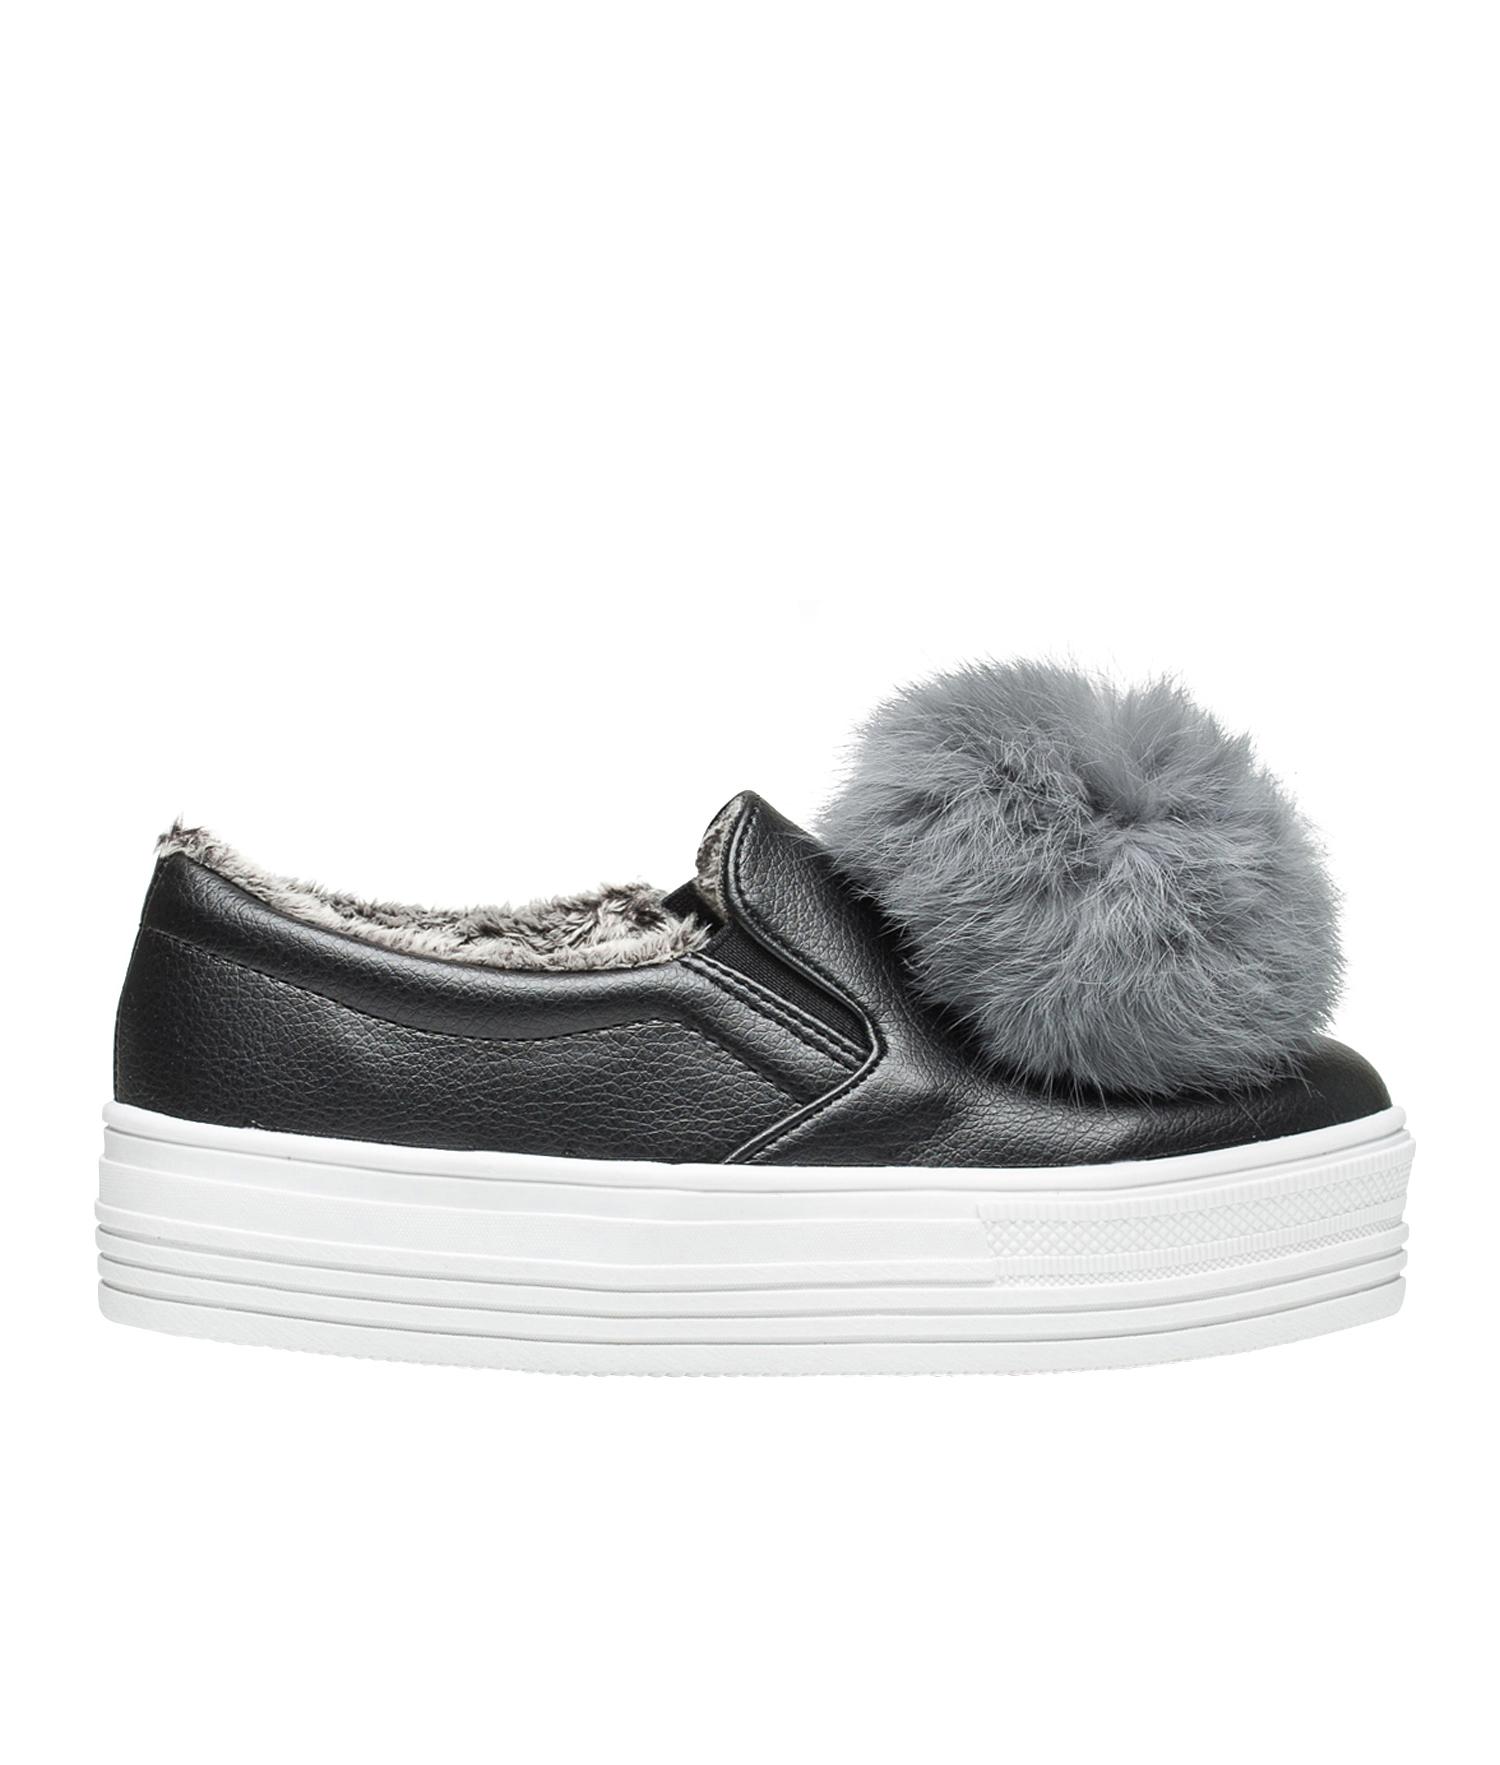 ff2508f2be4 AnnaKastle Womens Faux Fur Lined Pom Pom Slip Ons Black